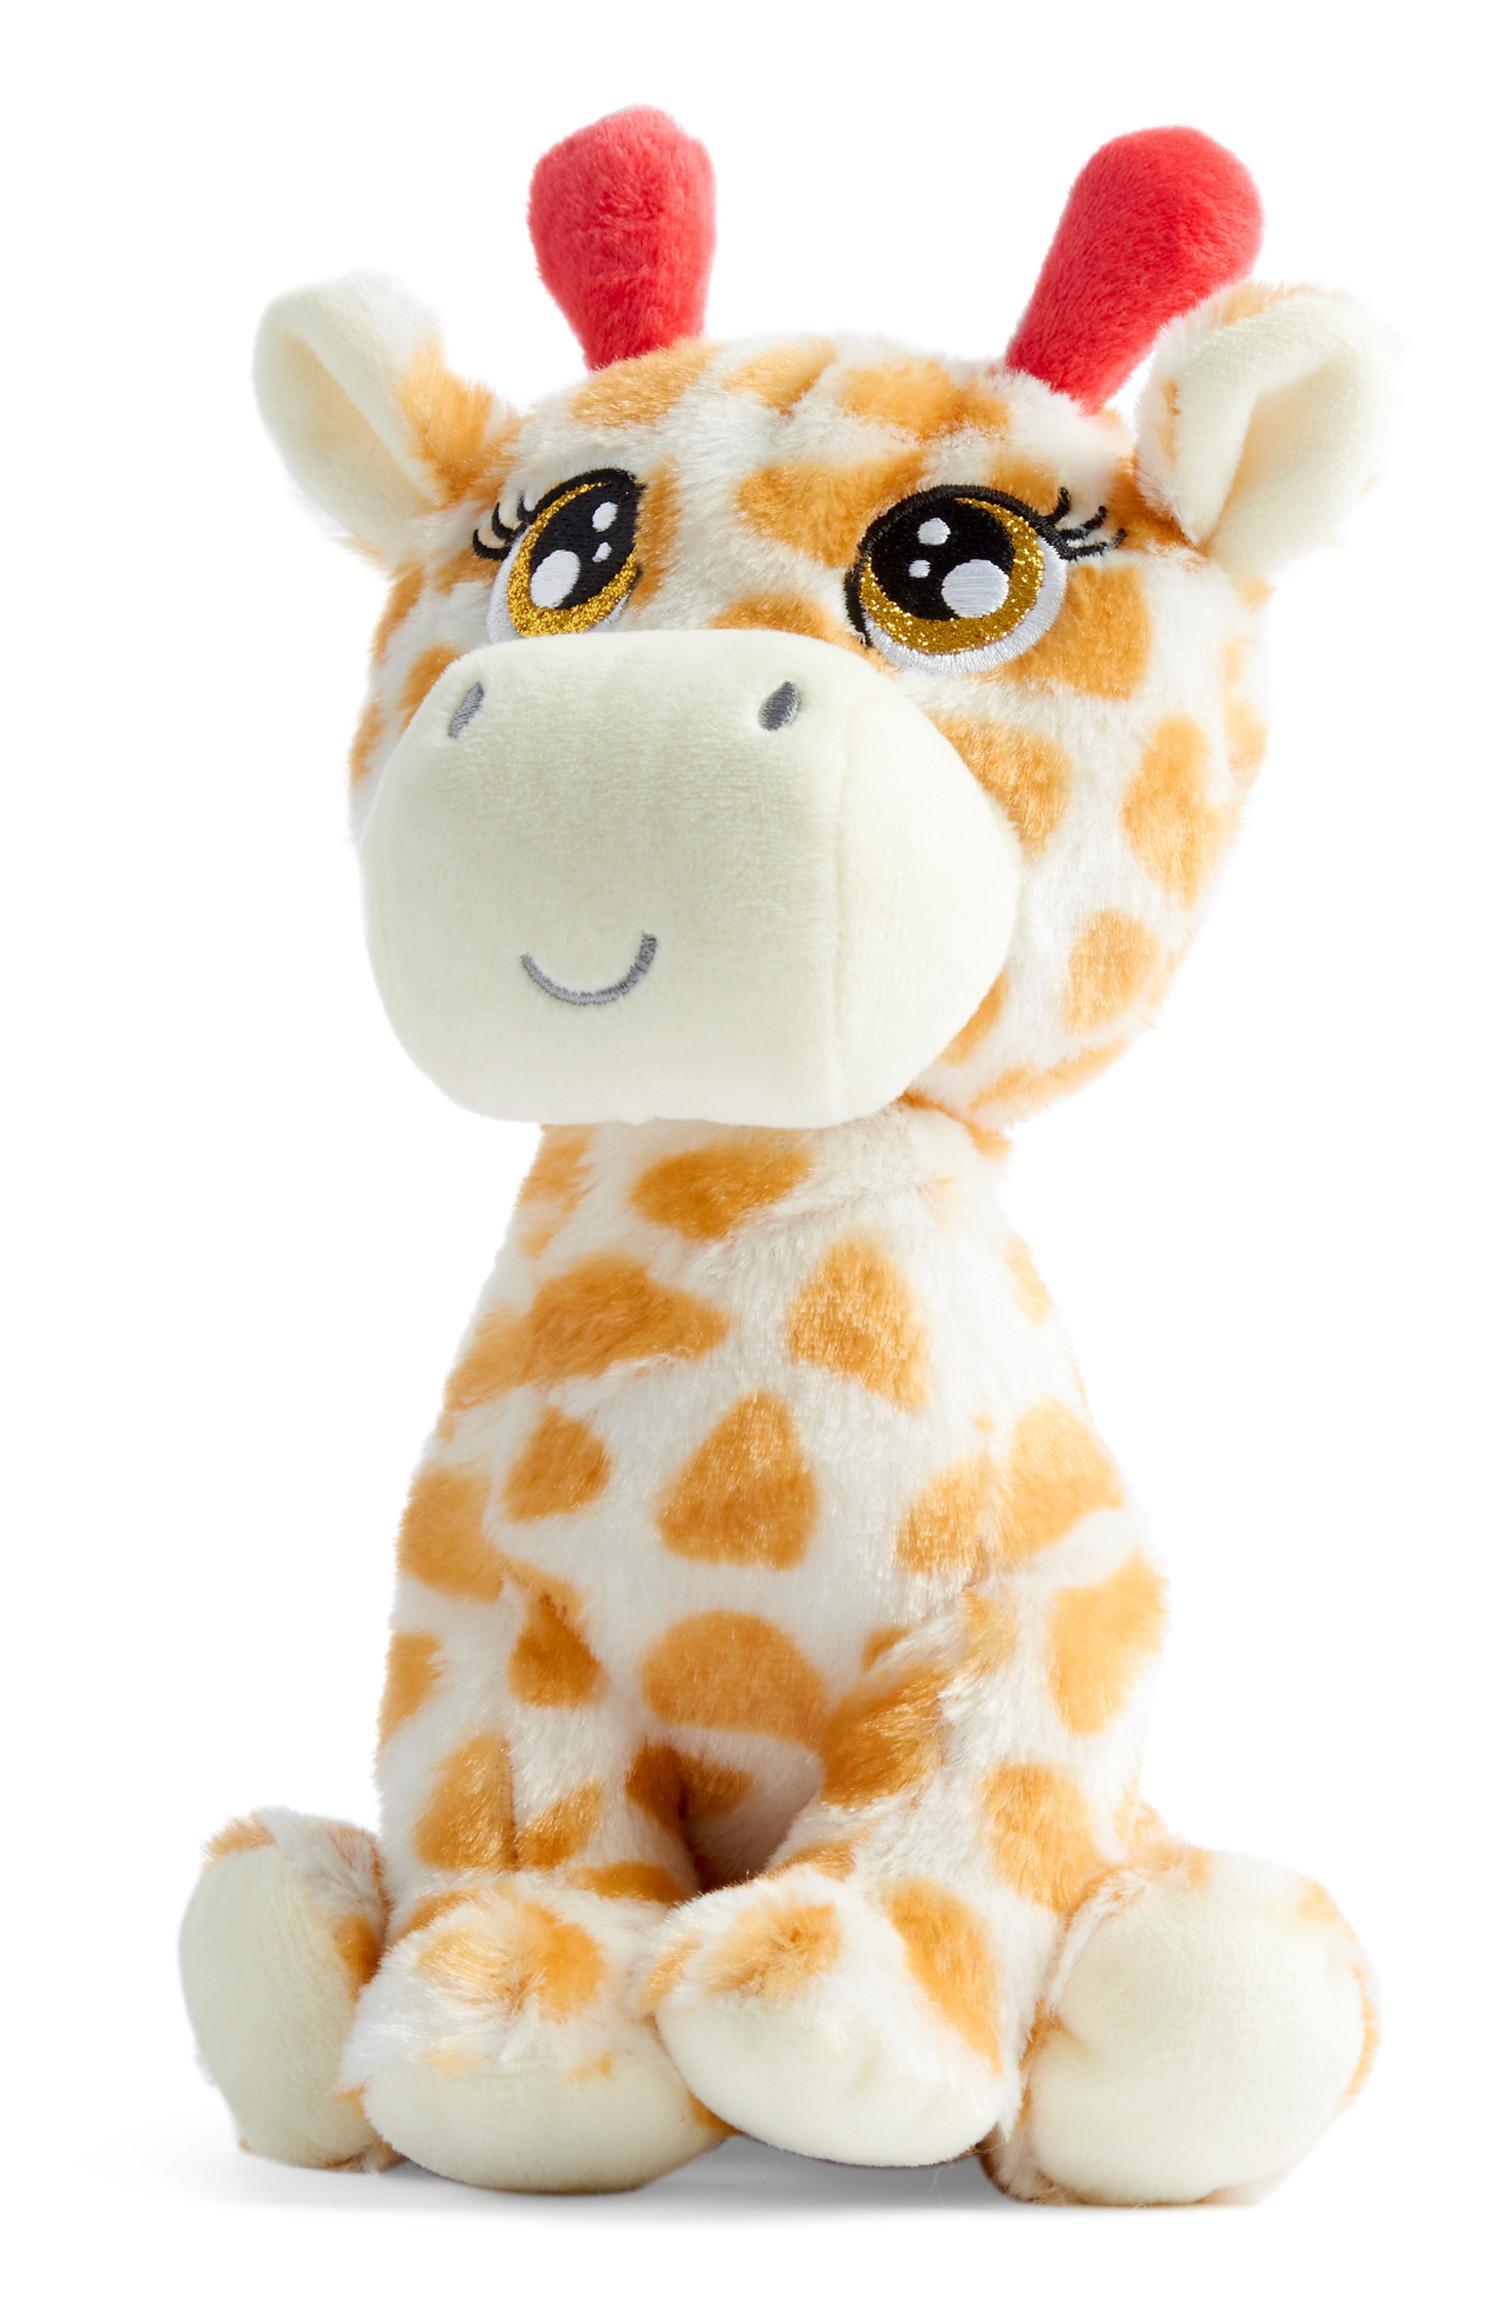 Giraffe Plush Teddy